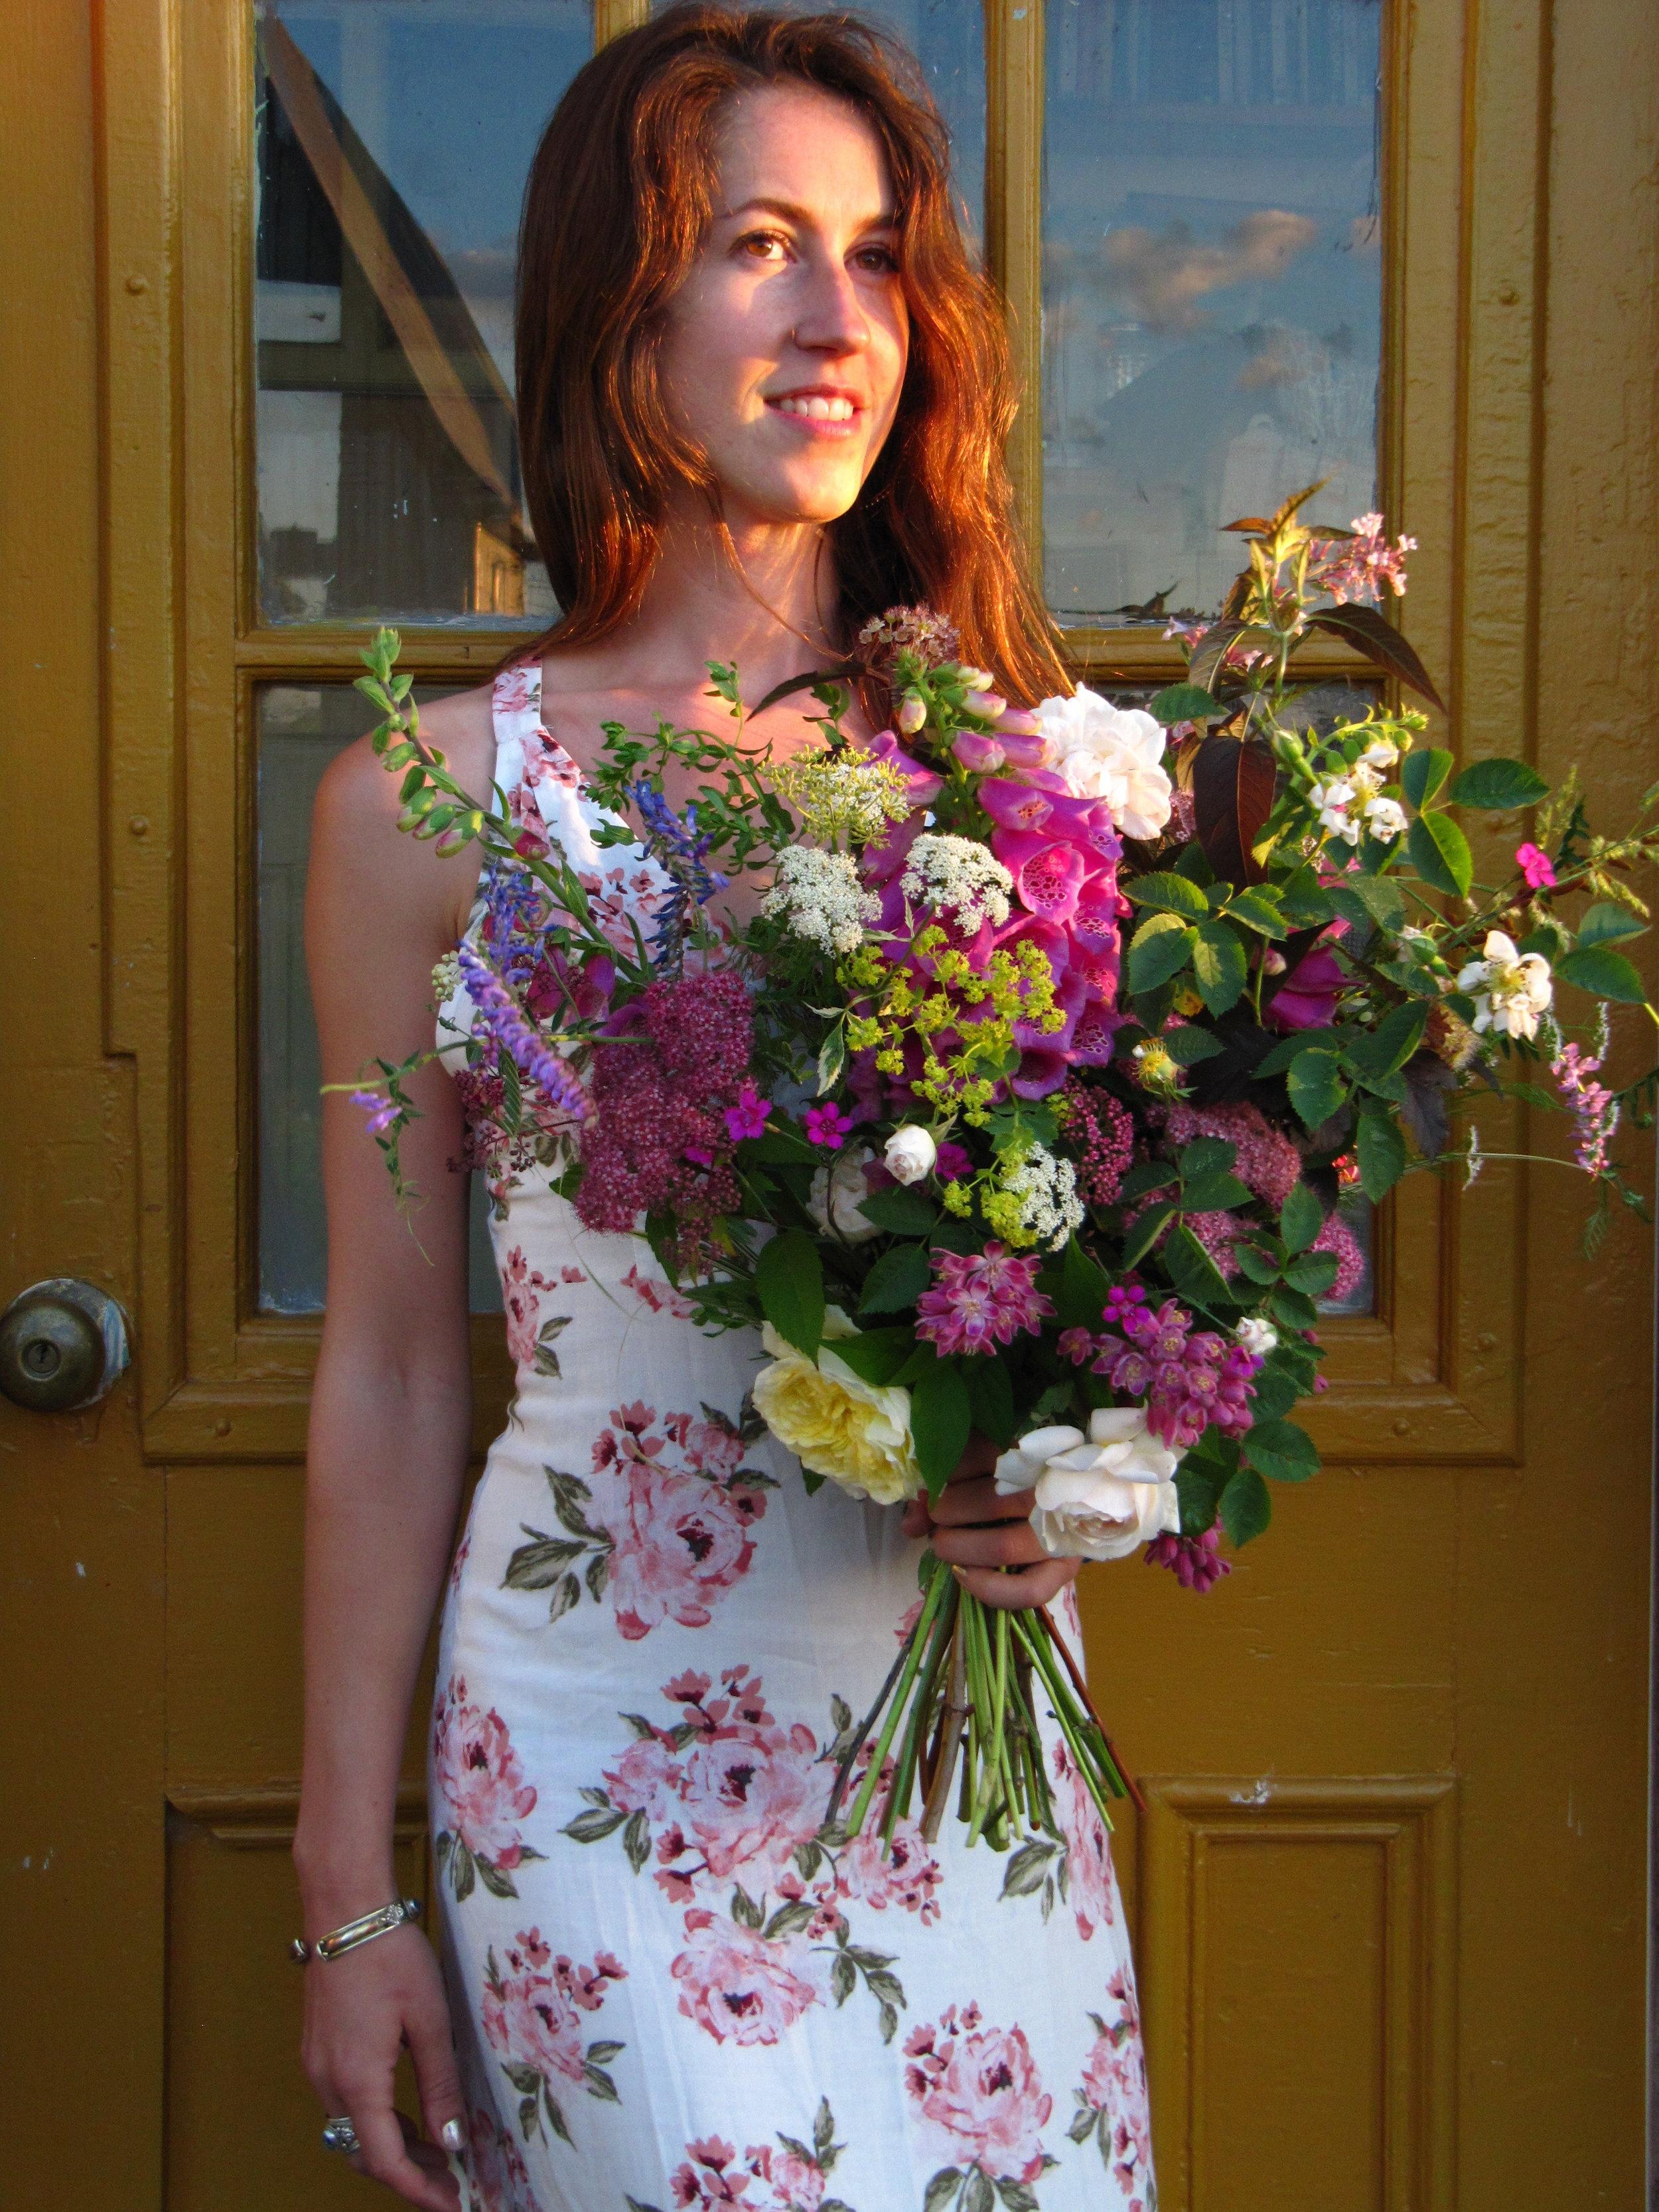 Halifax bouquet subscription / flower CSA 2018. Luxury hand-tied farm fresh flowers. Hedgerow Flower Company (flower farm and florist), Nova Scotia, Canada.